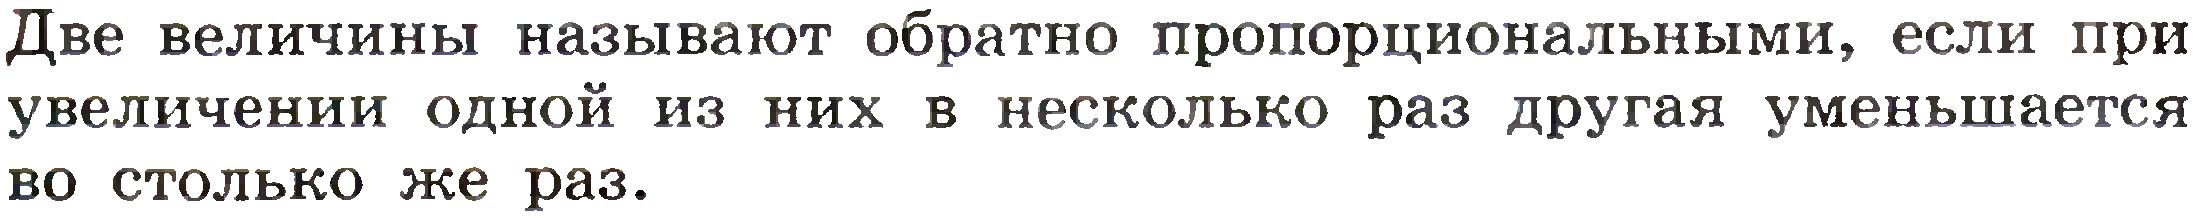 hello_html_44804b2c.png